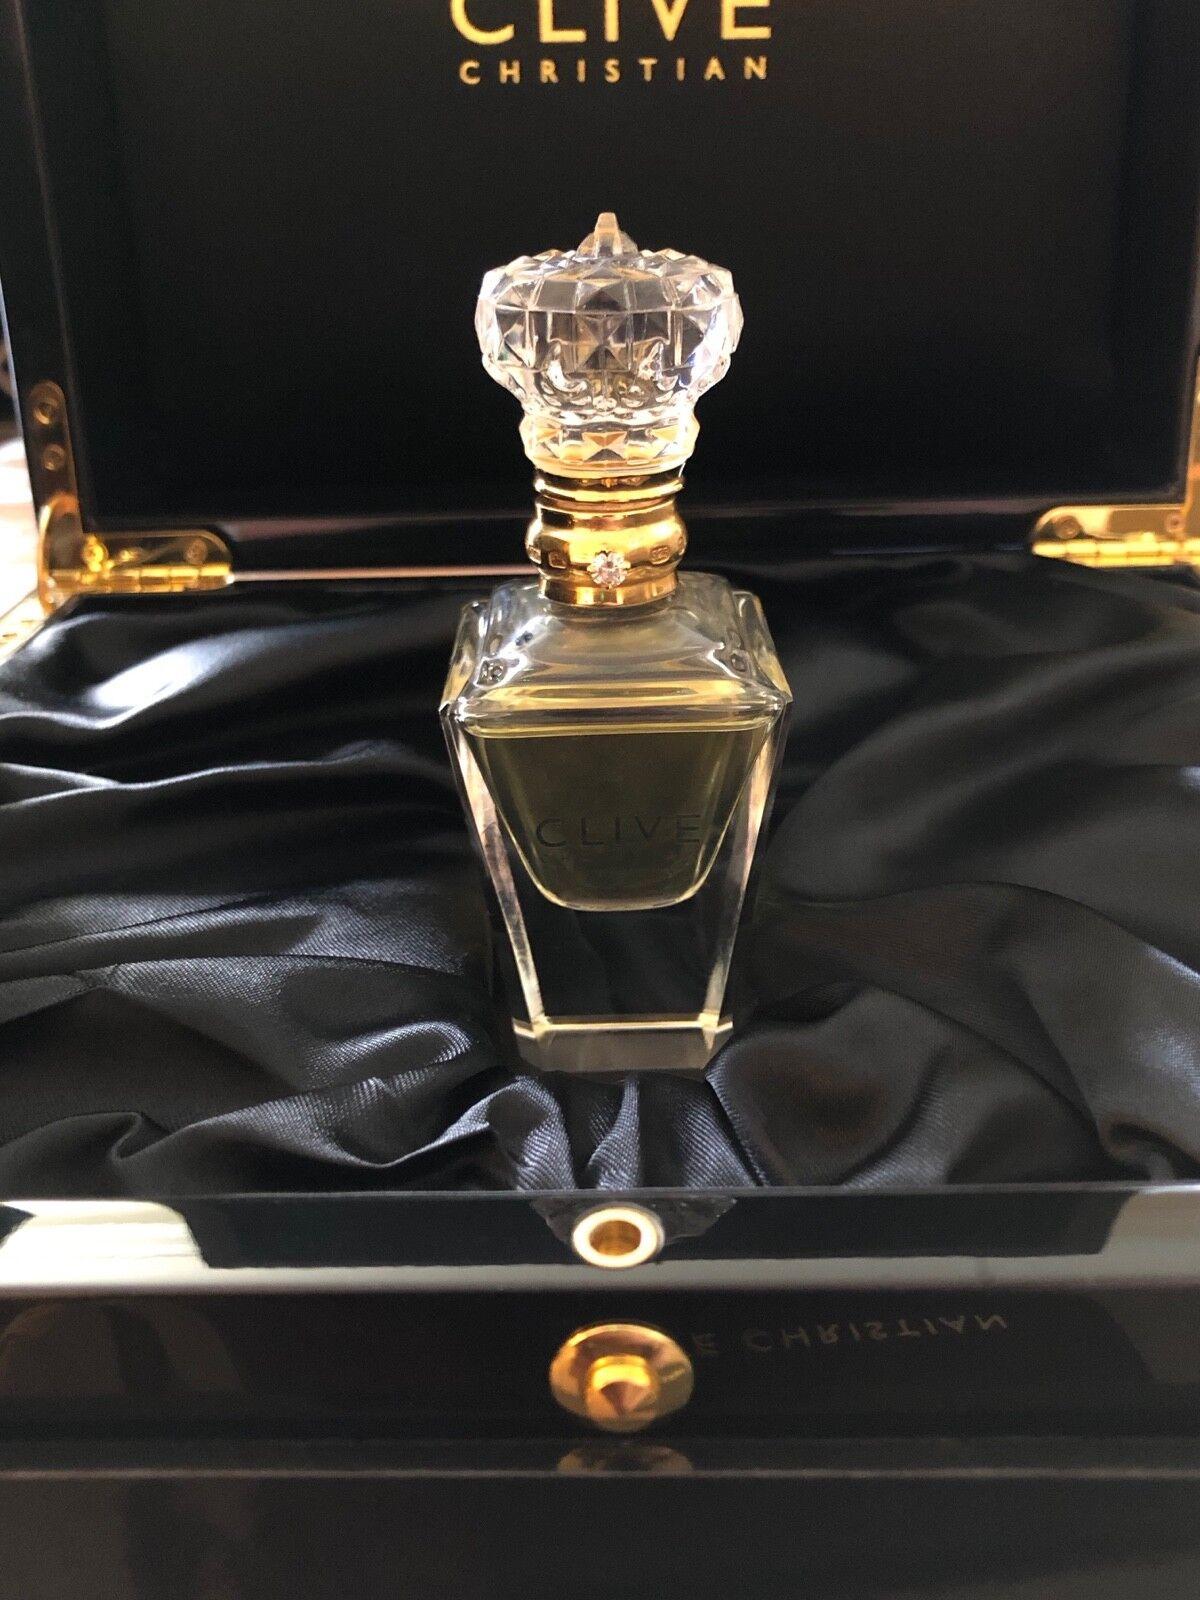 Genuine Clive Christian No. 1 Men Pure Perfume Crystal Bottl